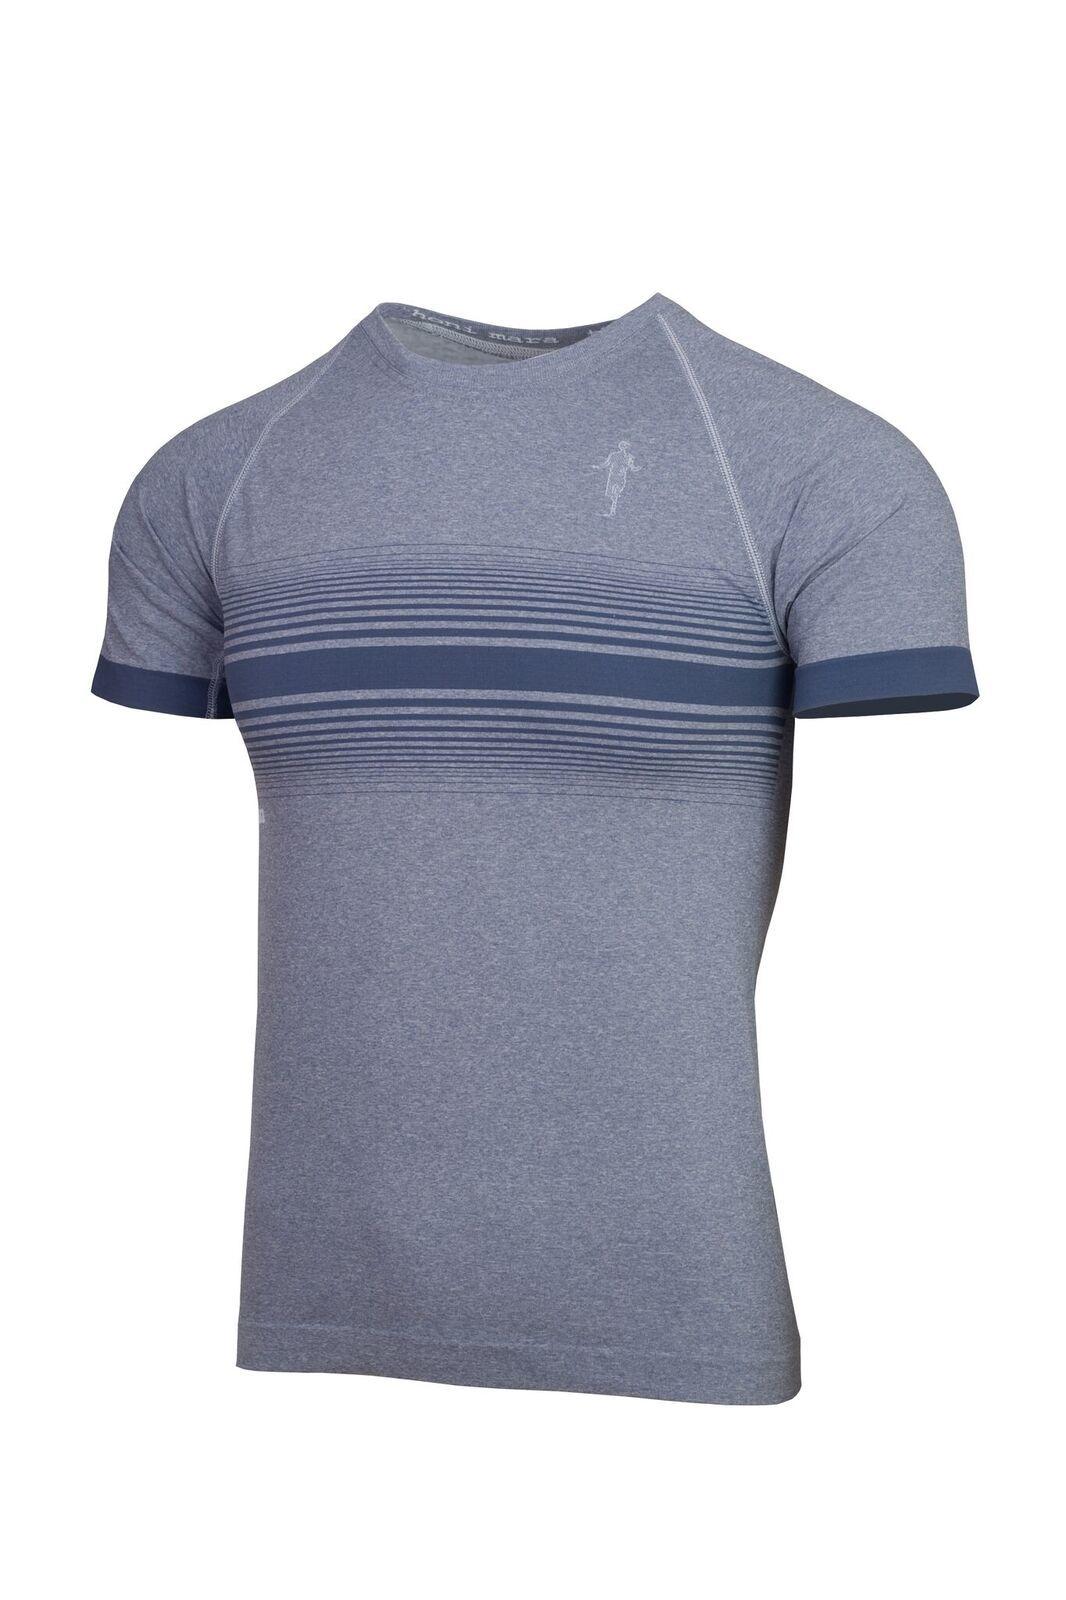 Thonimara Sommer Ti Shirt in Grau